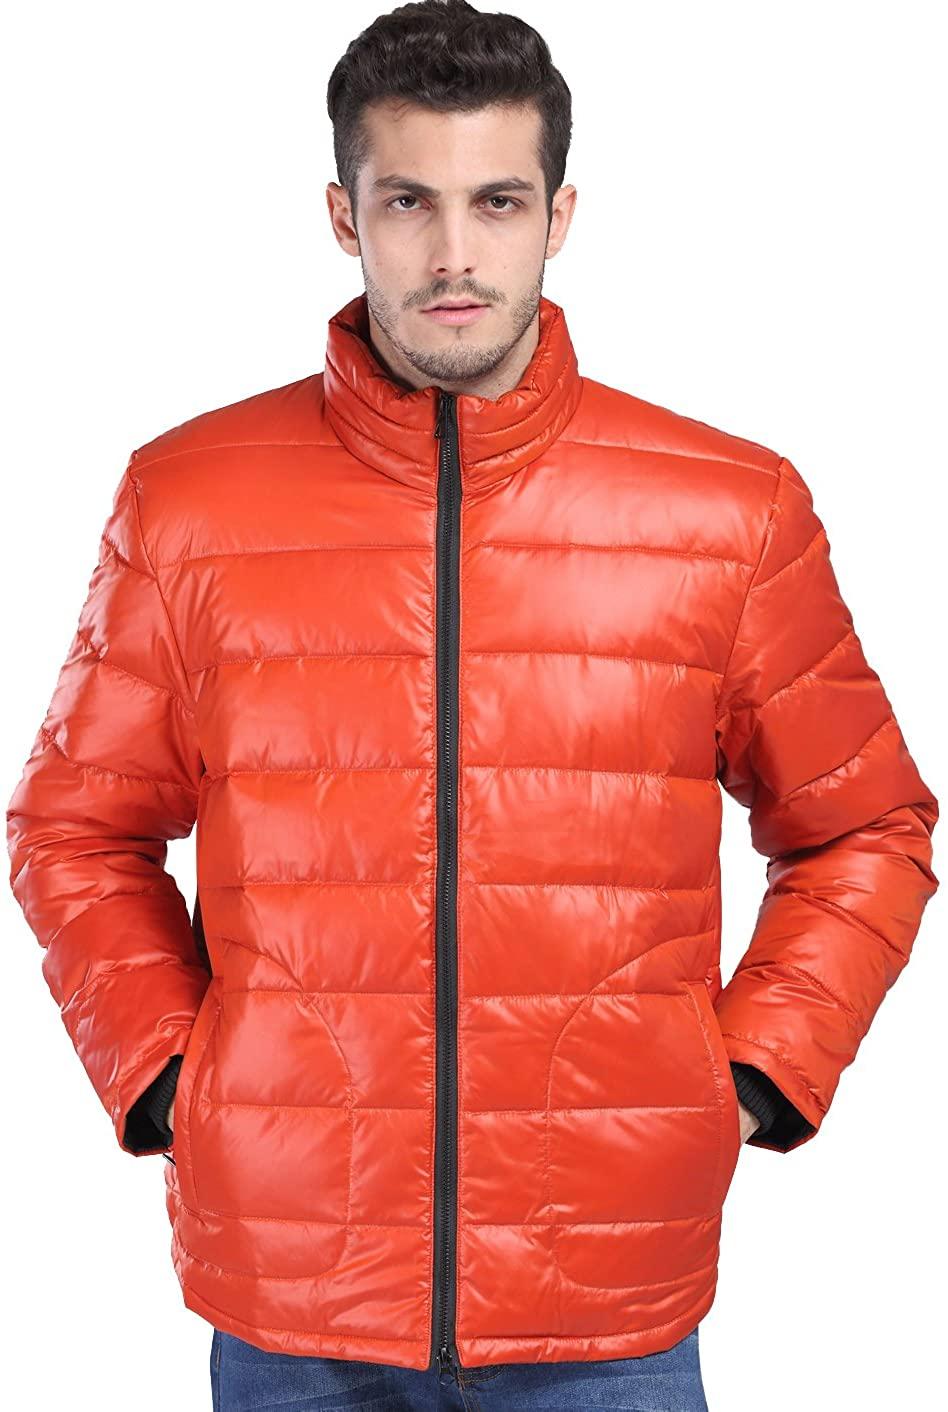 fashciaga Men's White Duck Down Puffer Jacket